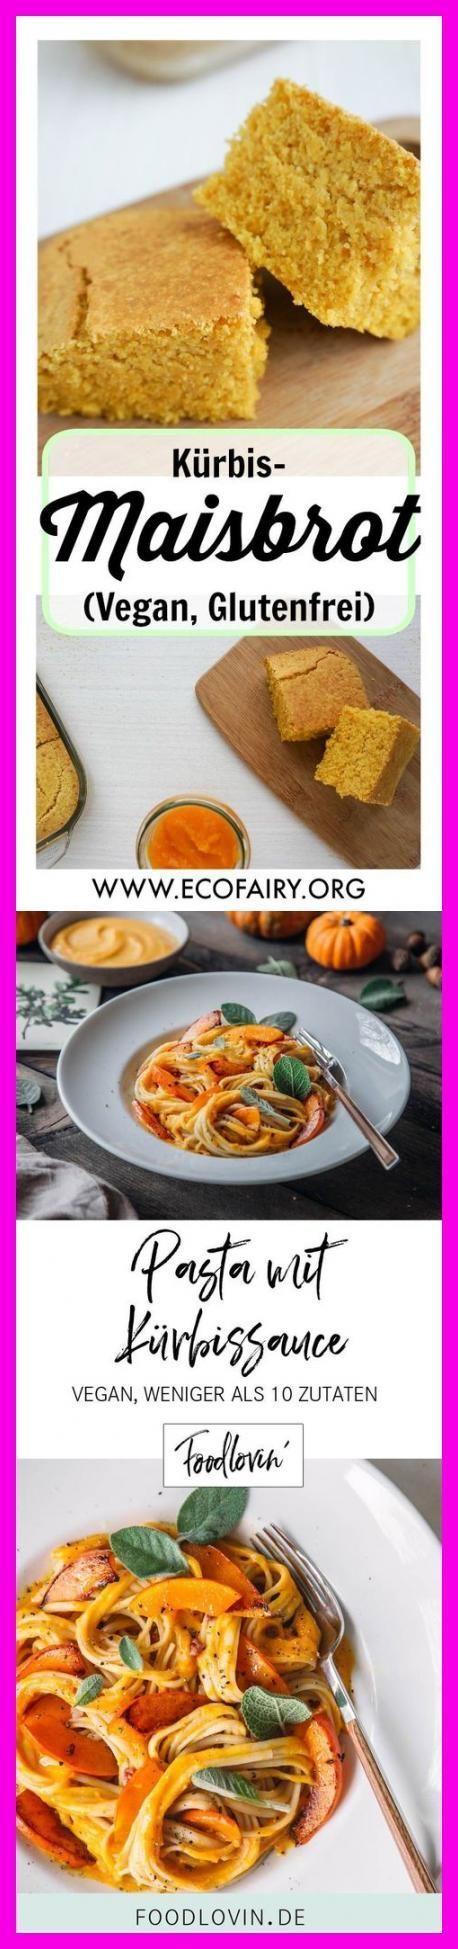 Photo of Kurbis Gnocchi Vegan Paleo  EcoFairy   Blog Uber Nachhaltigkeit Und Plastikfrei …